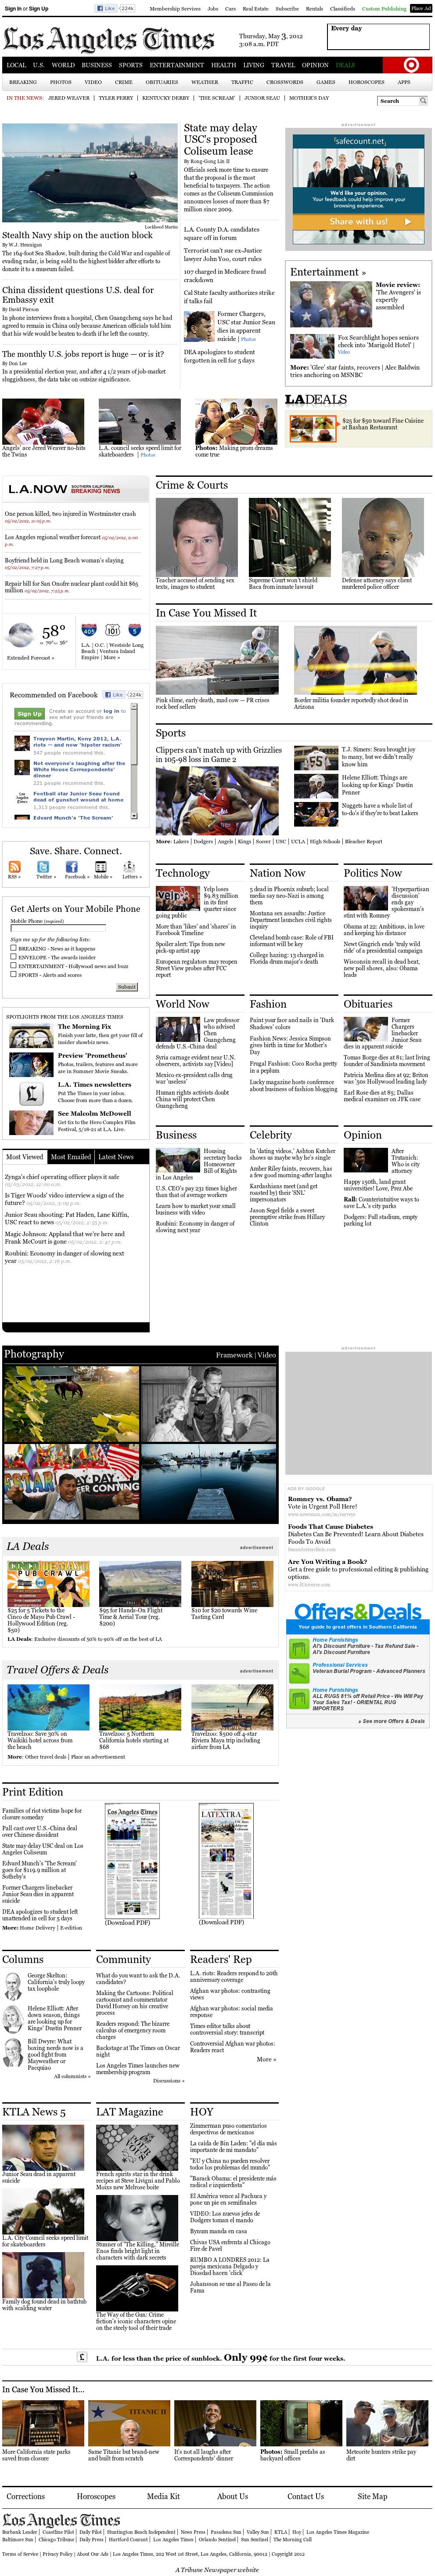 Los Angeles Times at Thursday May 3, 2012, 10:08 a.m. UTC